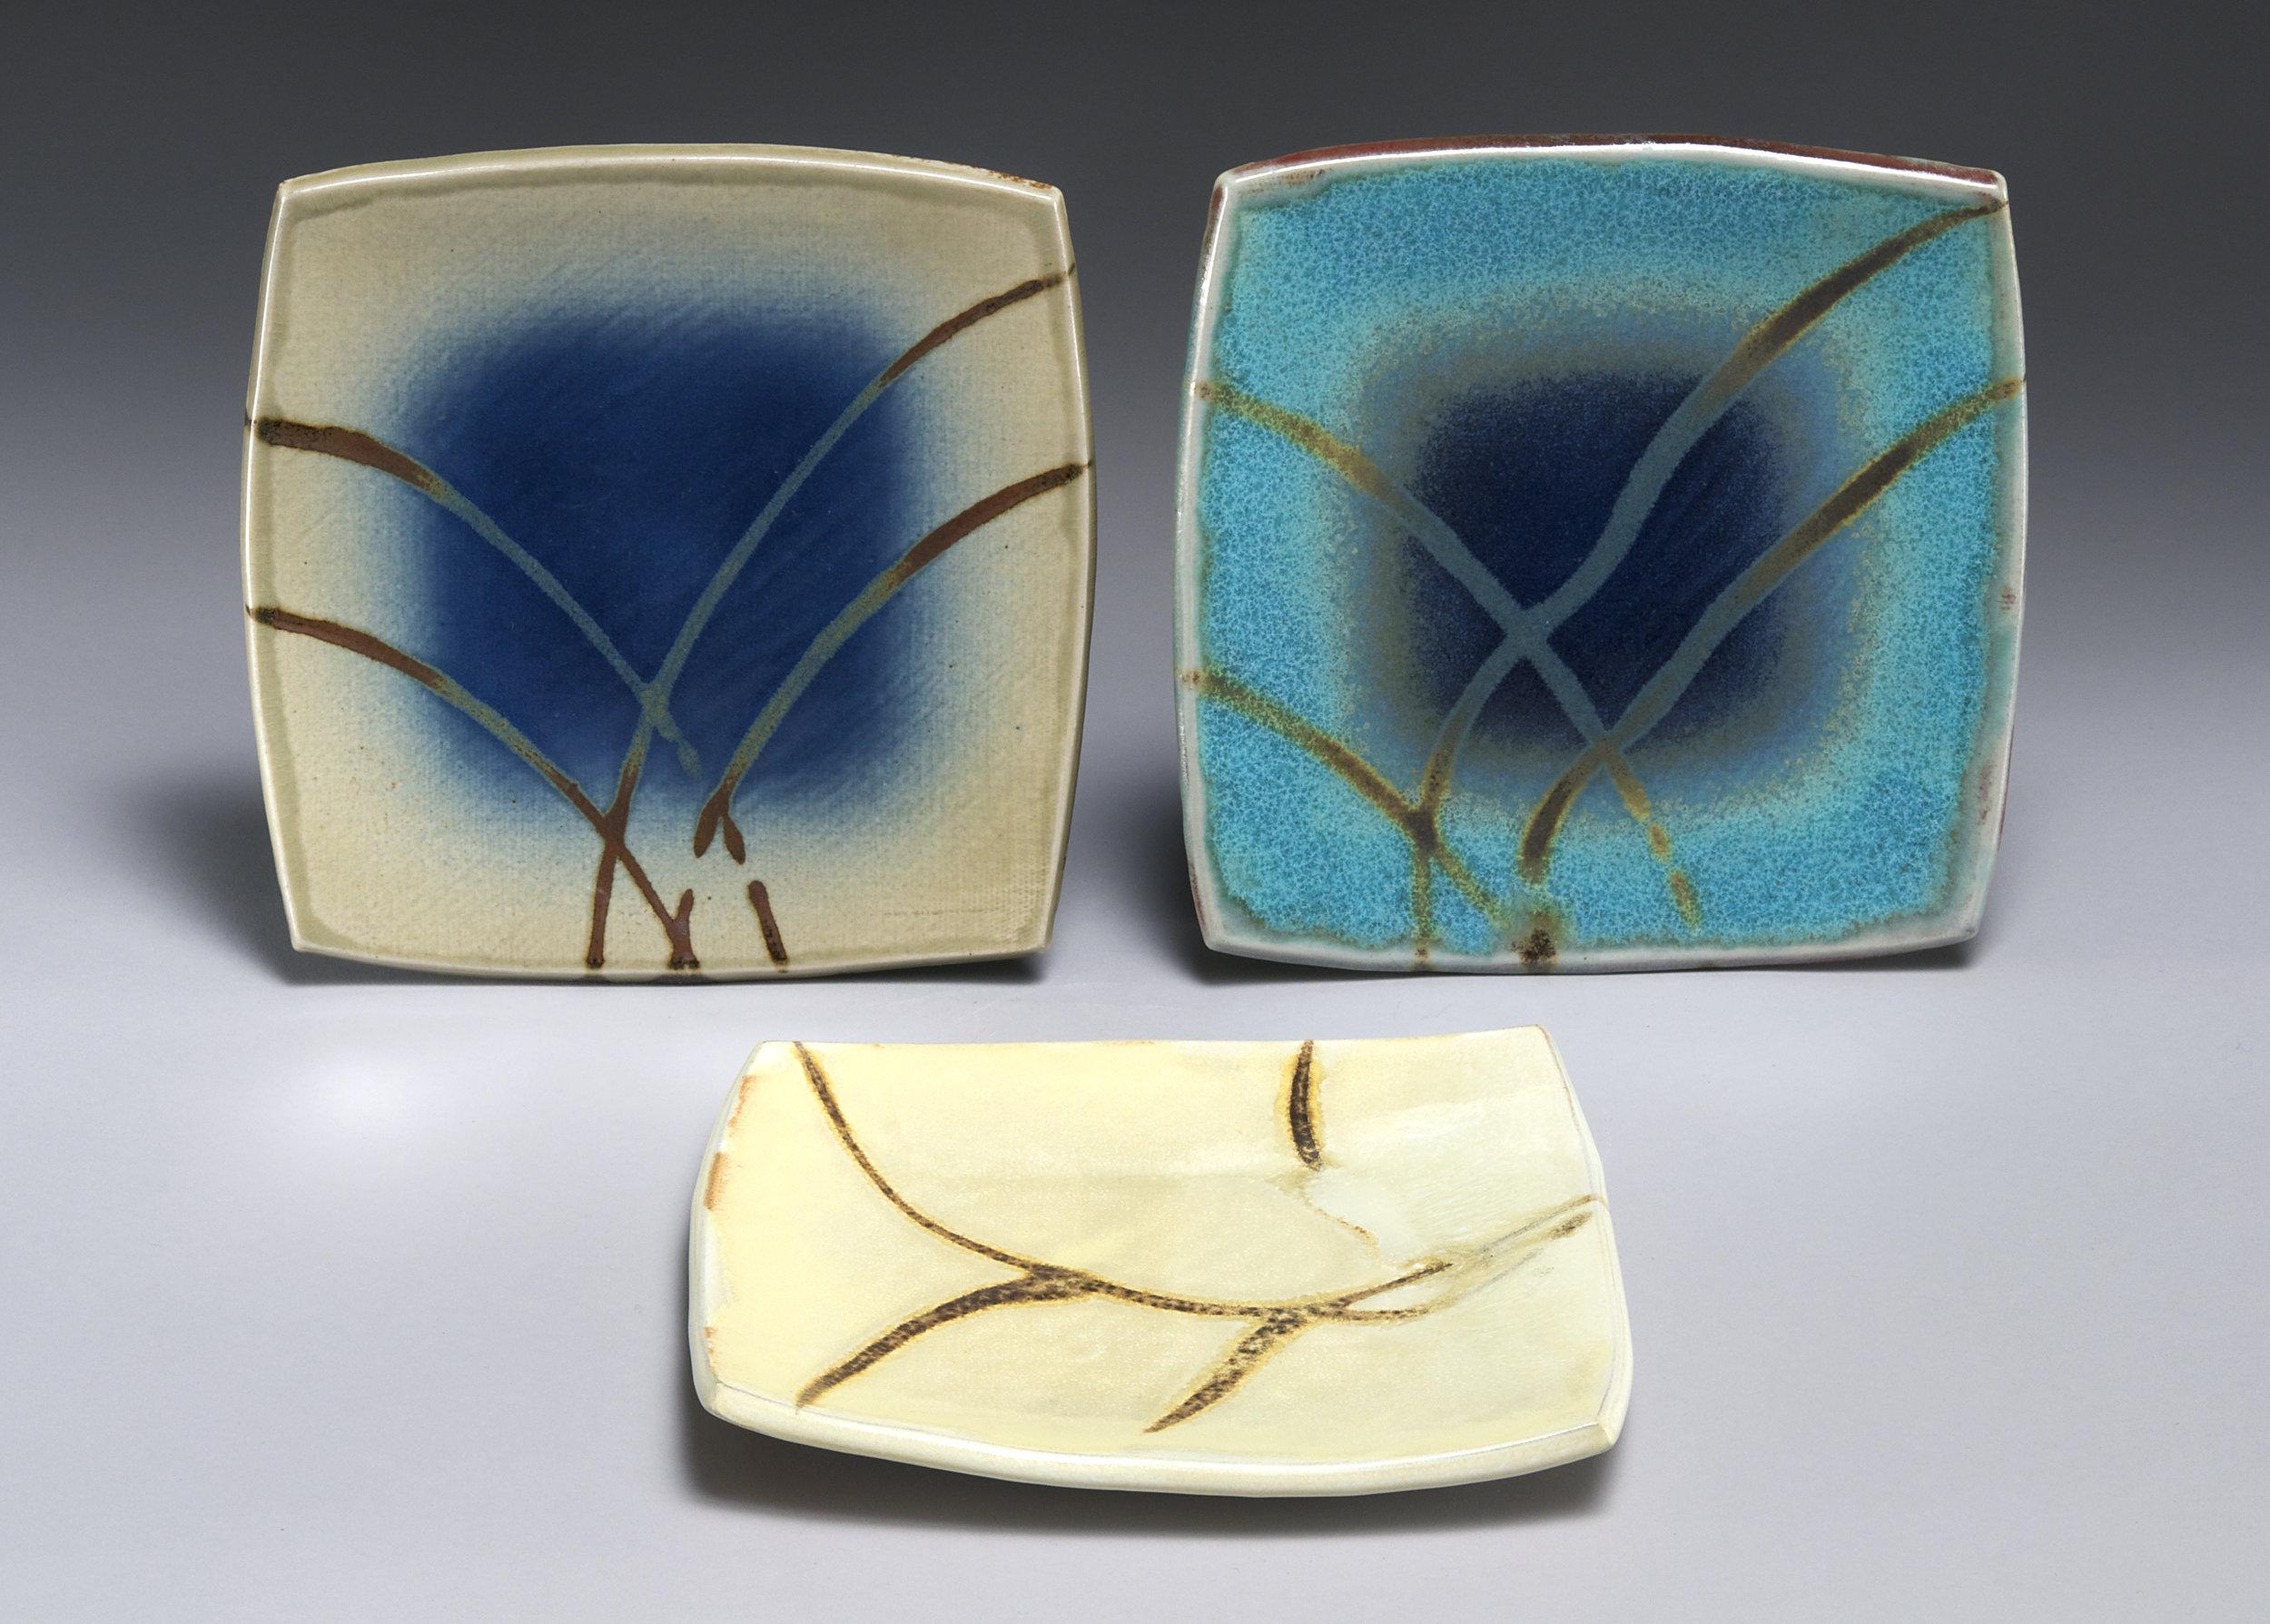 Square slab plates